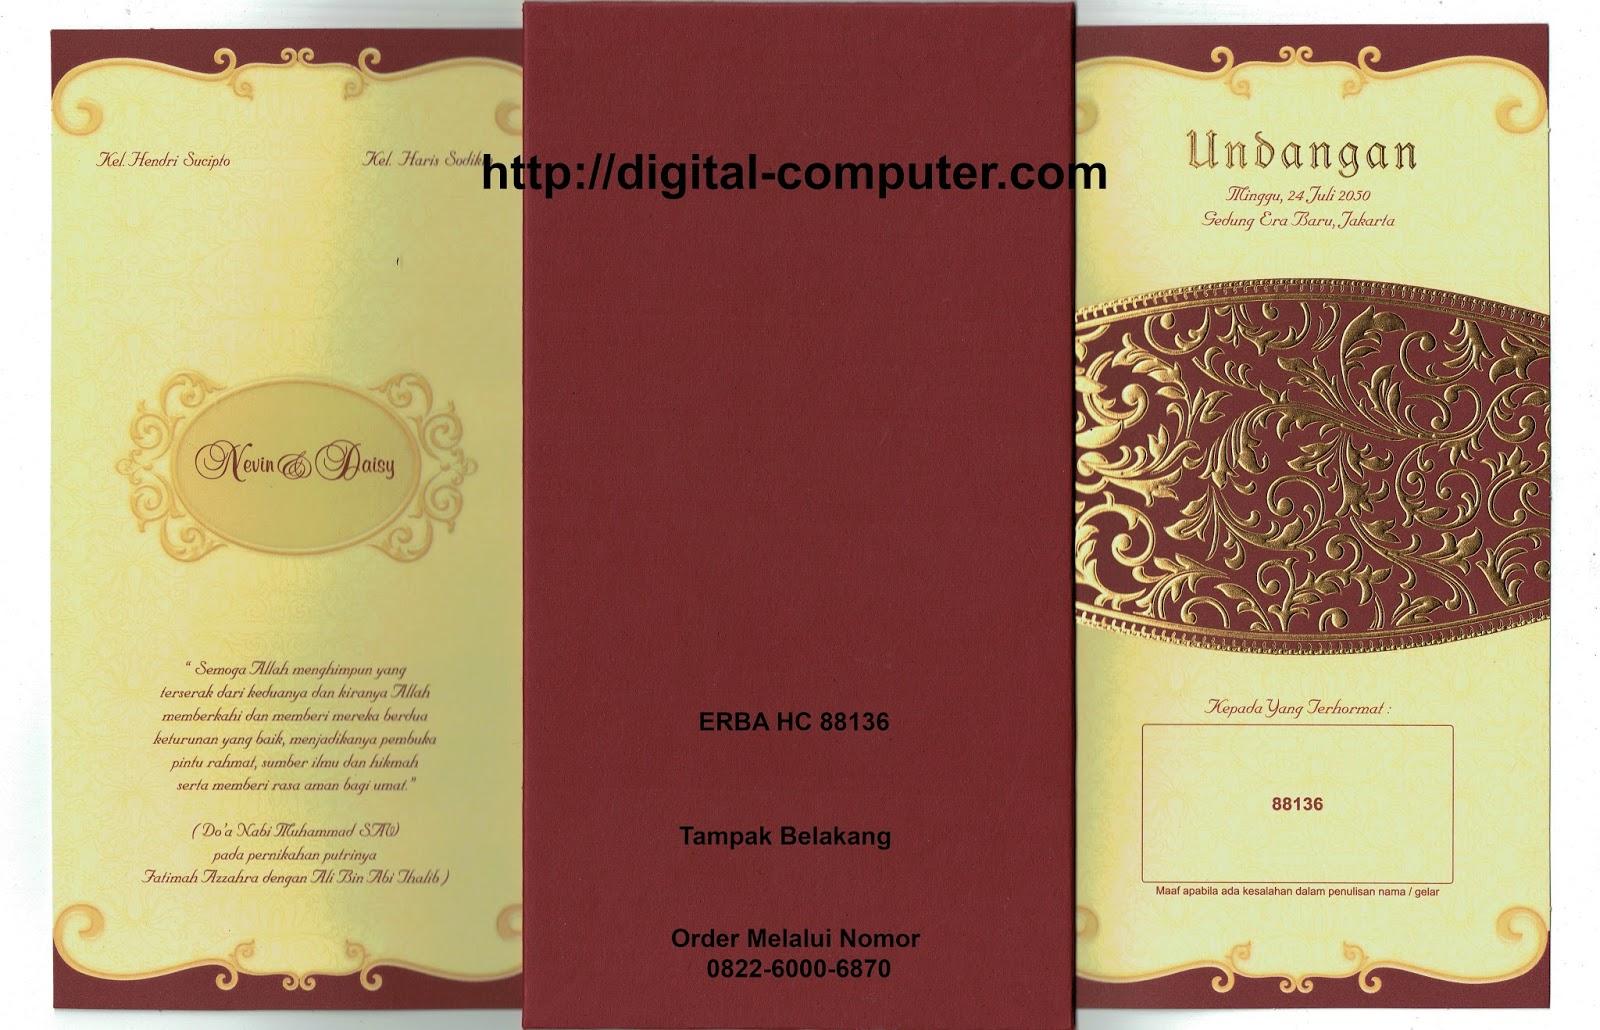 undangan hardcover ERBA HC-88136